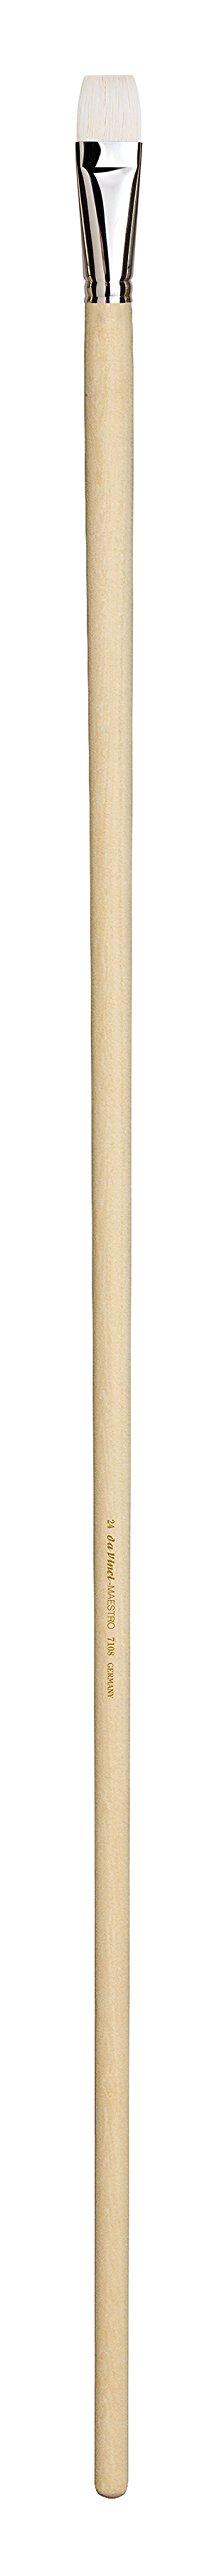 da Vinci Mural Series 7108 Maestro Paint Brush, Bright Hand-Interlocked Hog Bristle with 1-Meter Handle, Size 24